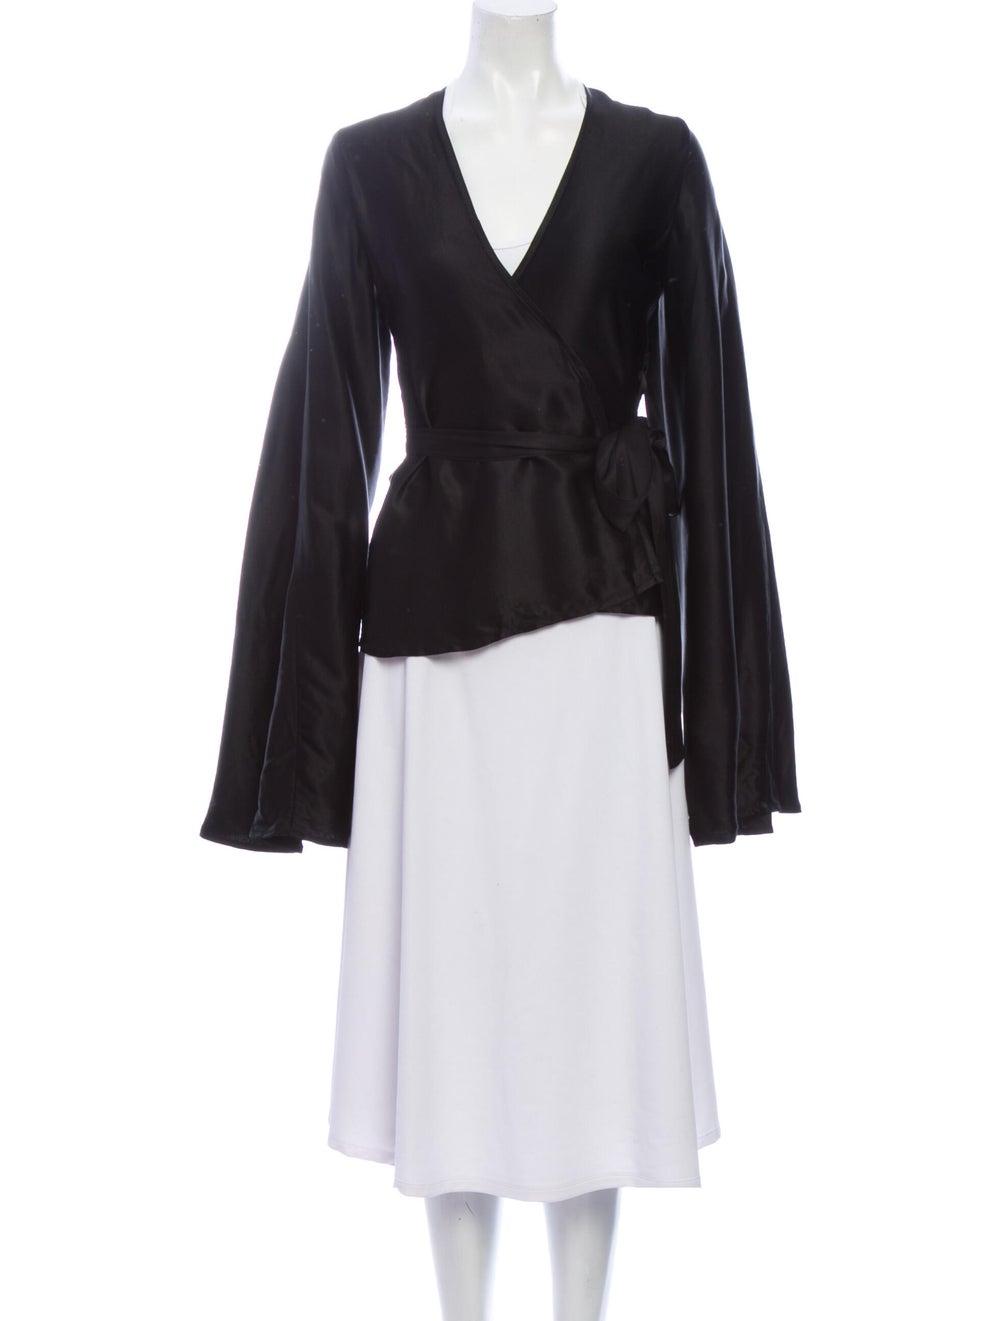 Beaufille V-Neck Long Sleeve Blouse Black - image 1